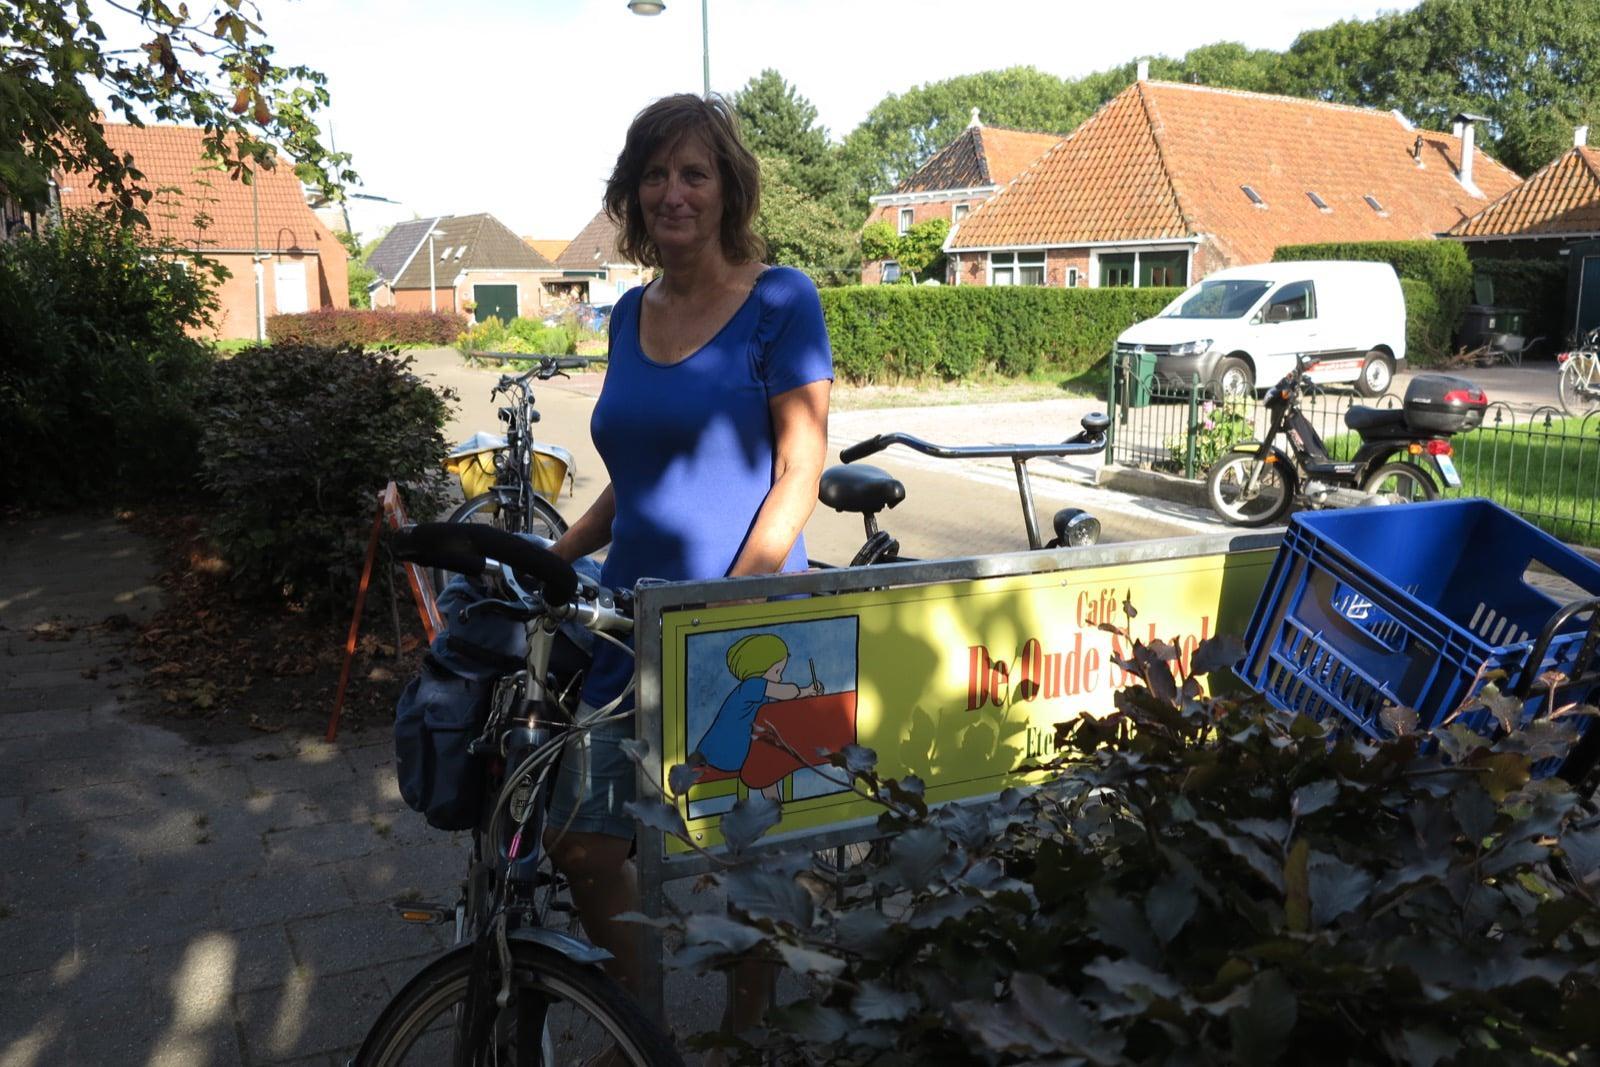 et-fiets-en-fietser-78-fietsers-op-terras-oude-school-op-zaterdagmiddag-oi.jpg